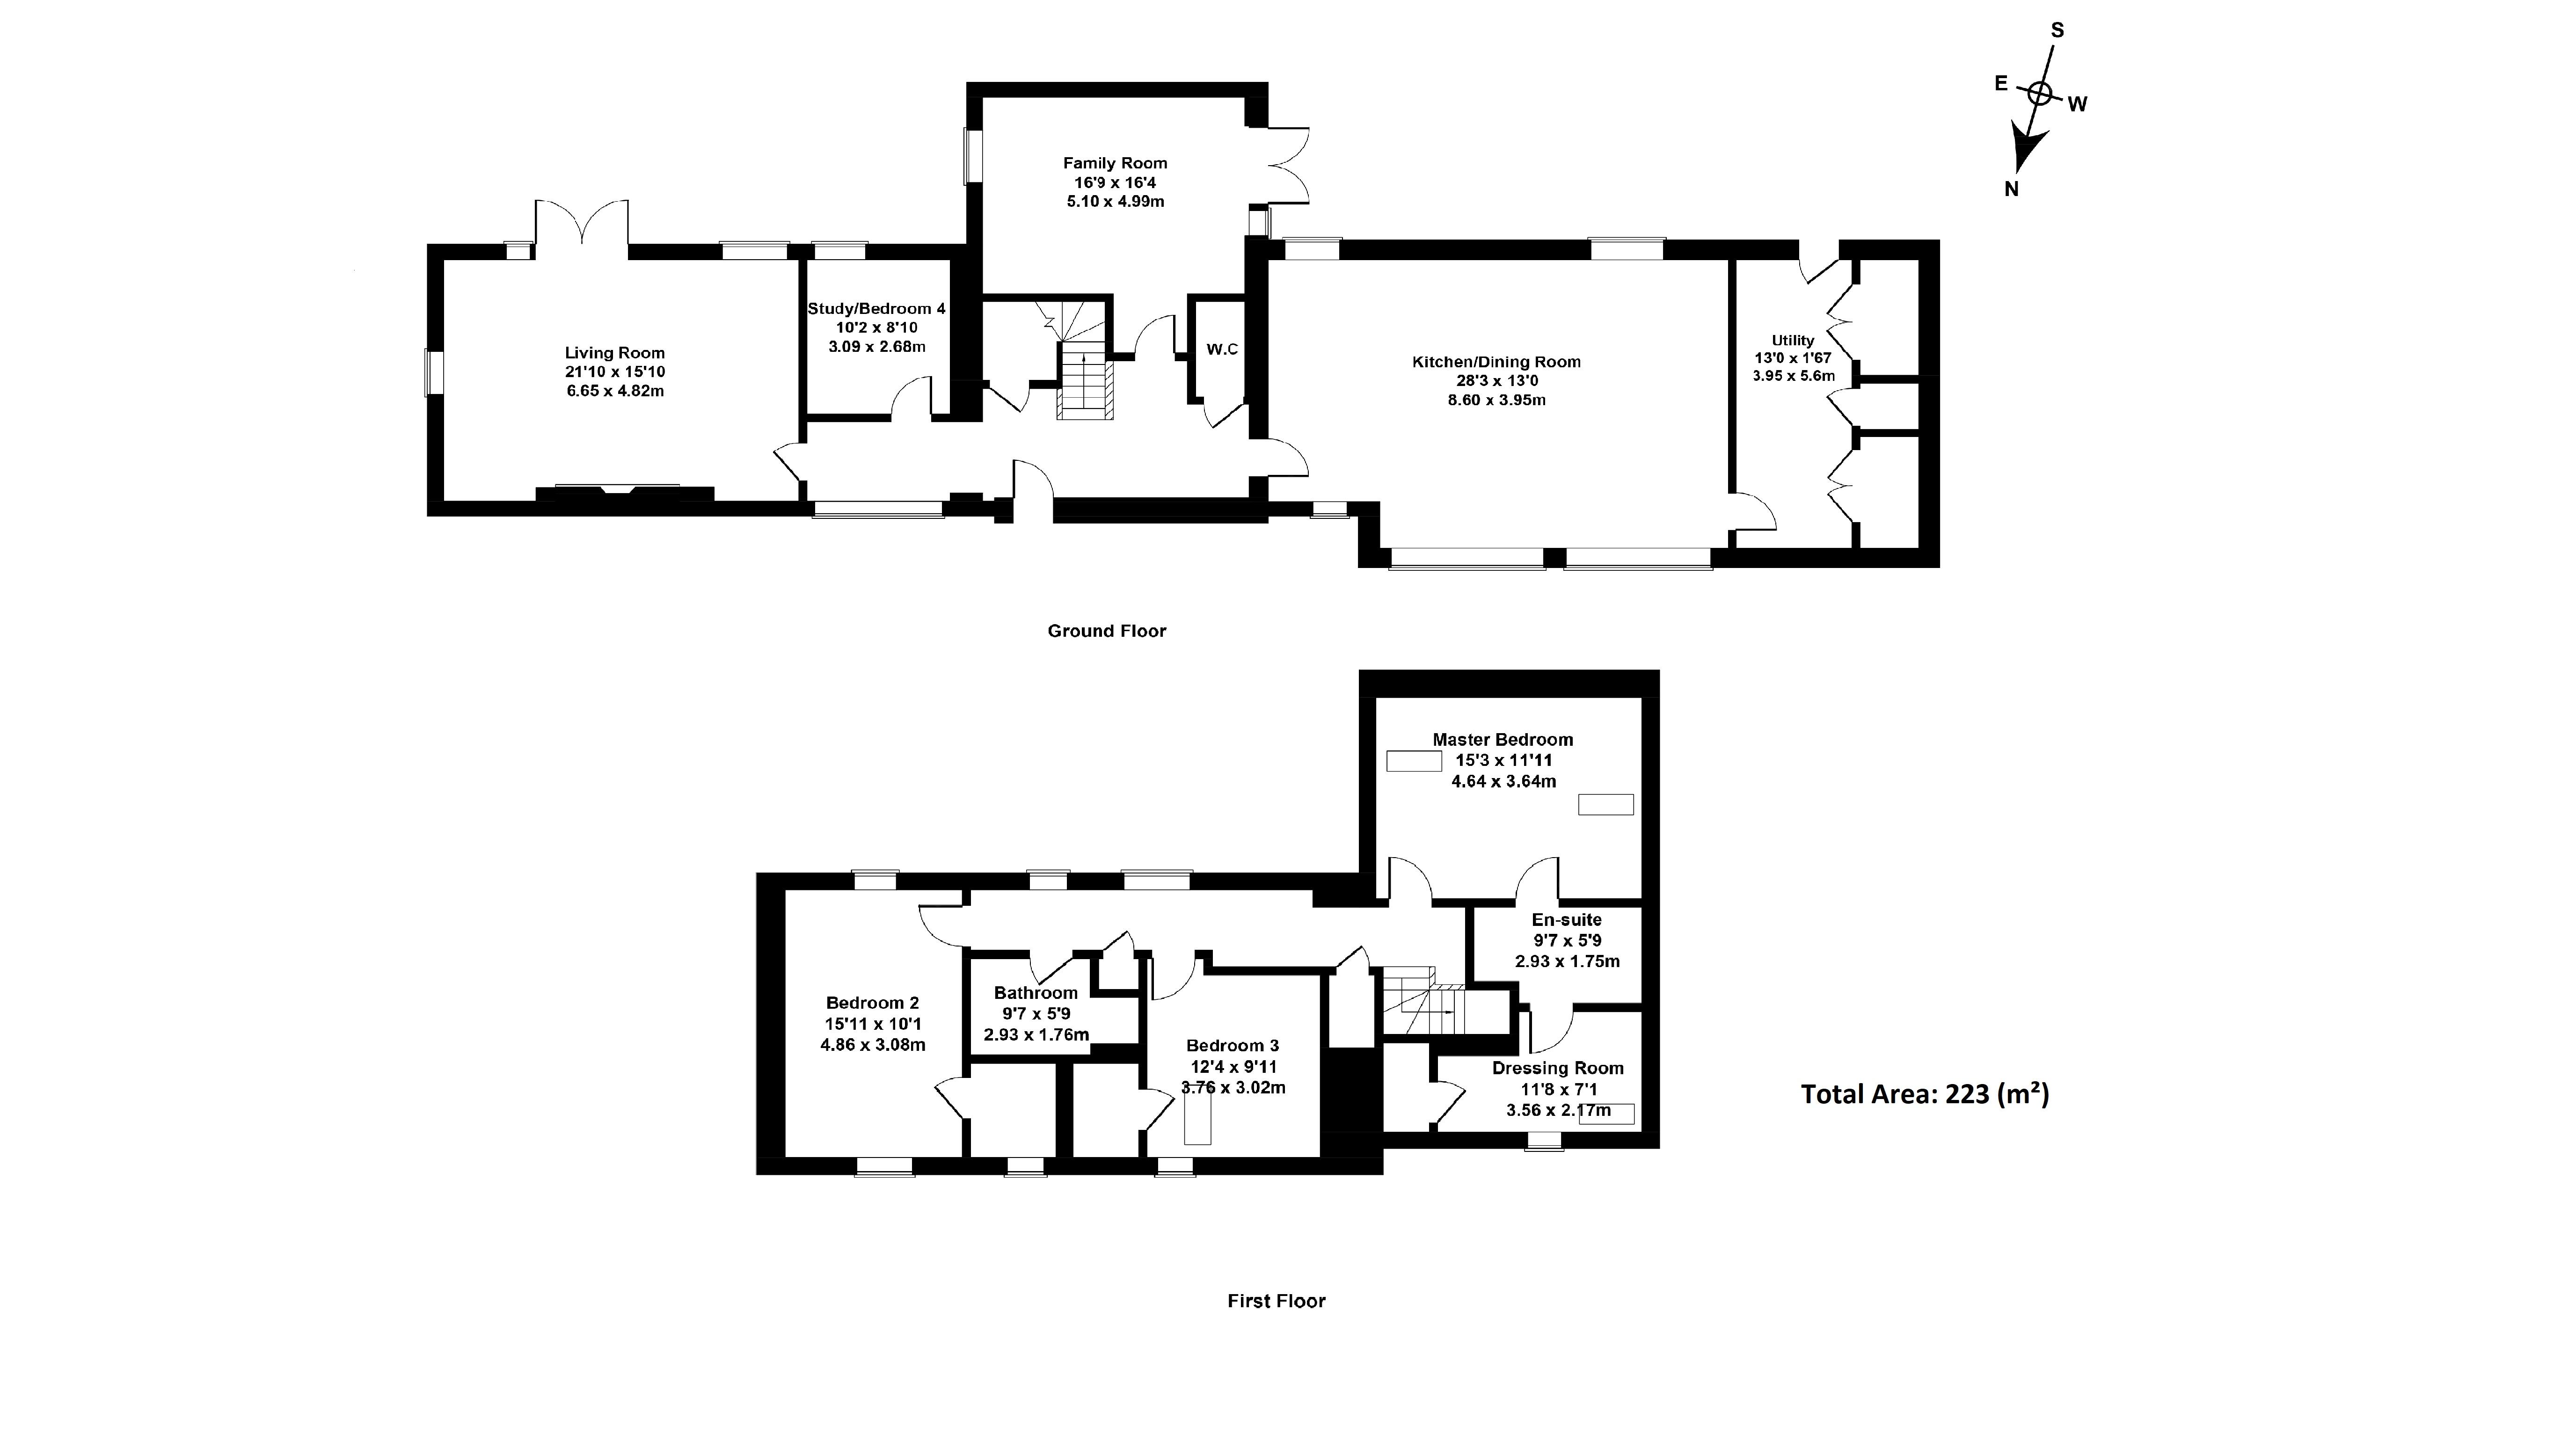 Floorplan 1 of 5  Wester Pike Mains, Auchendinny Mains Farm, Penicuik, Midlothian, EH26 8PG